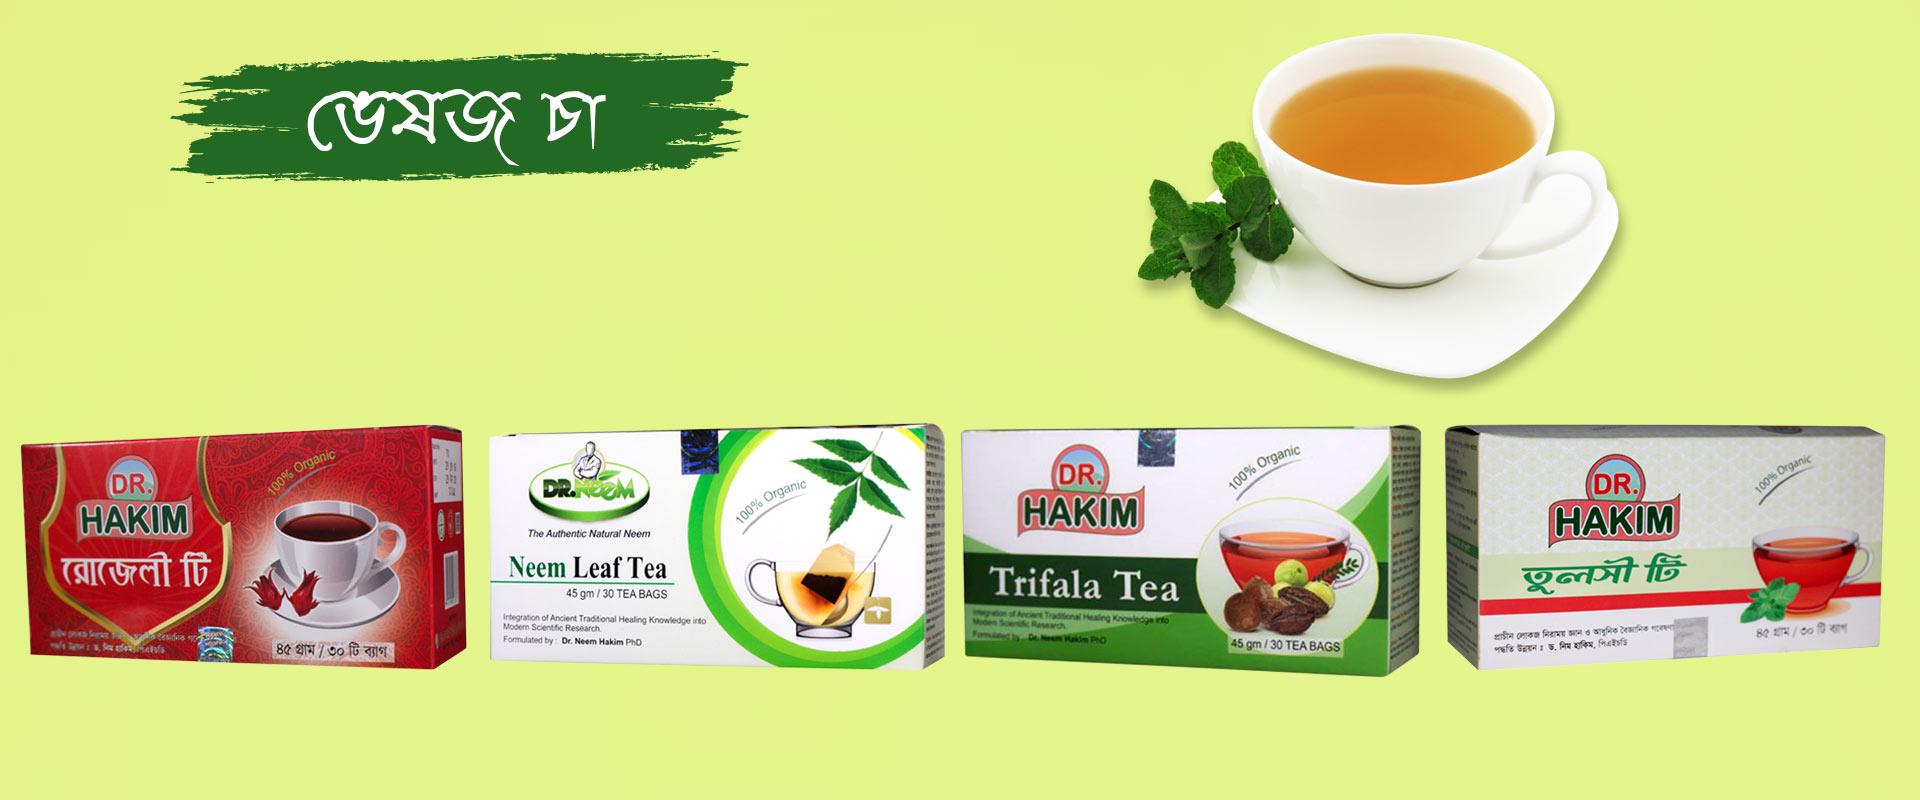 Herbal Tea Products